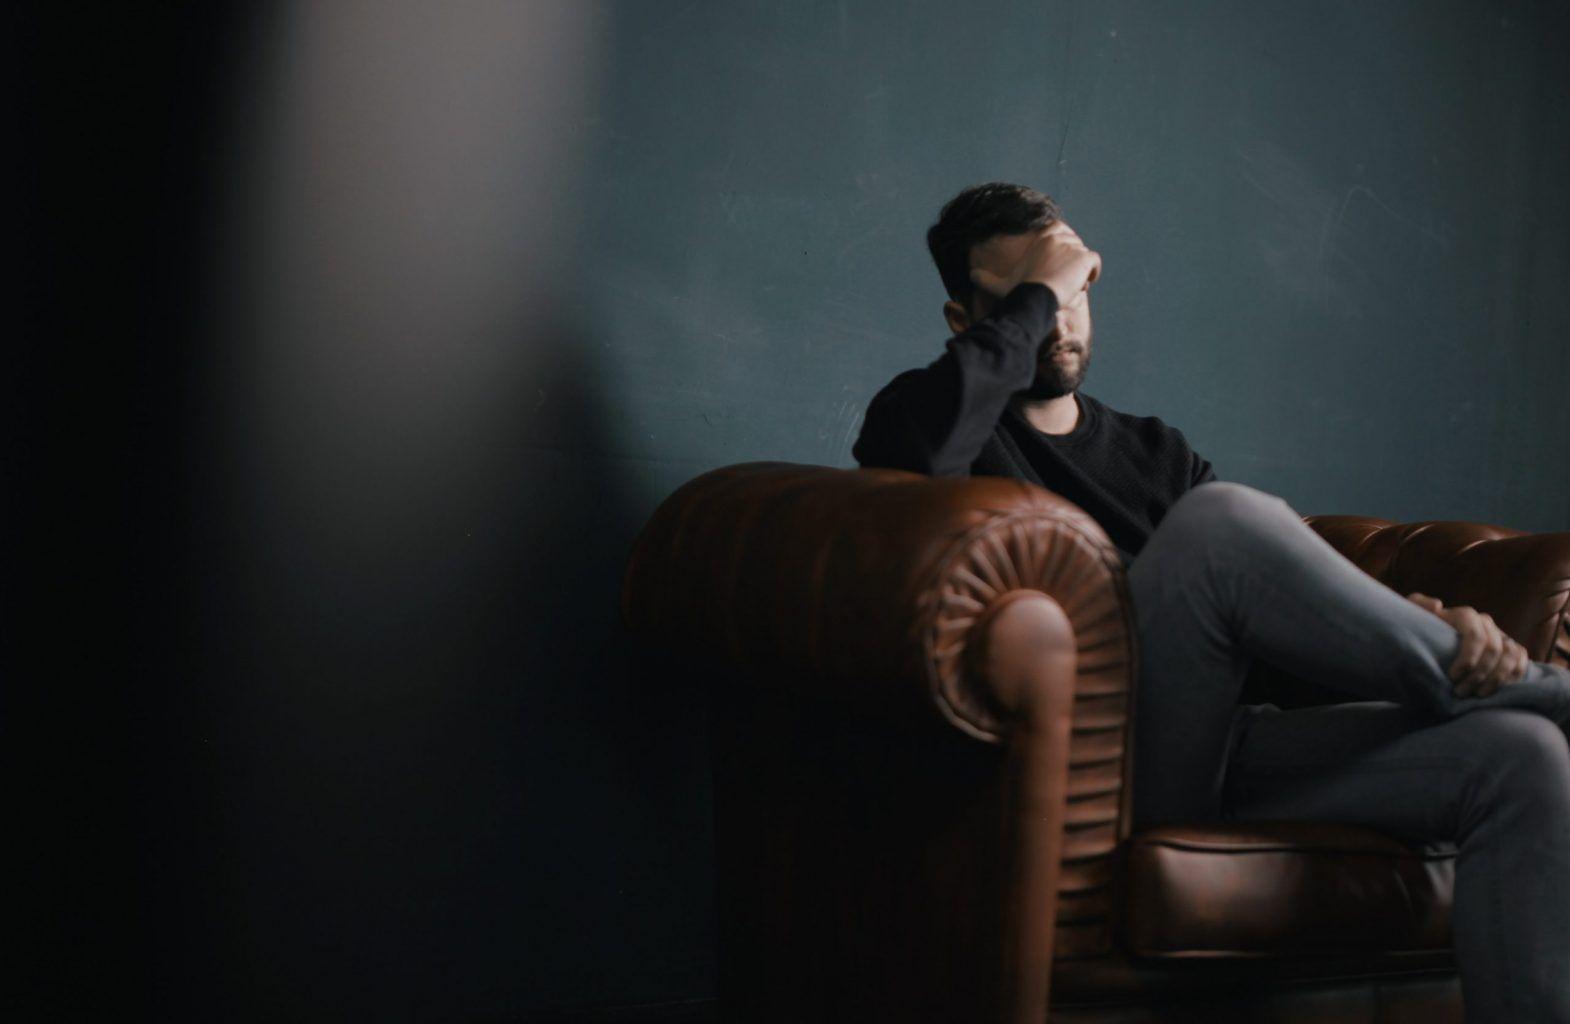 ansiedad sexual | Montse Iserte